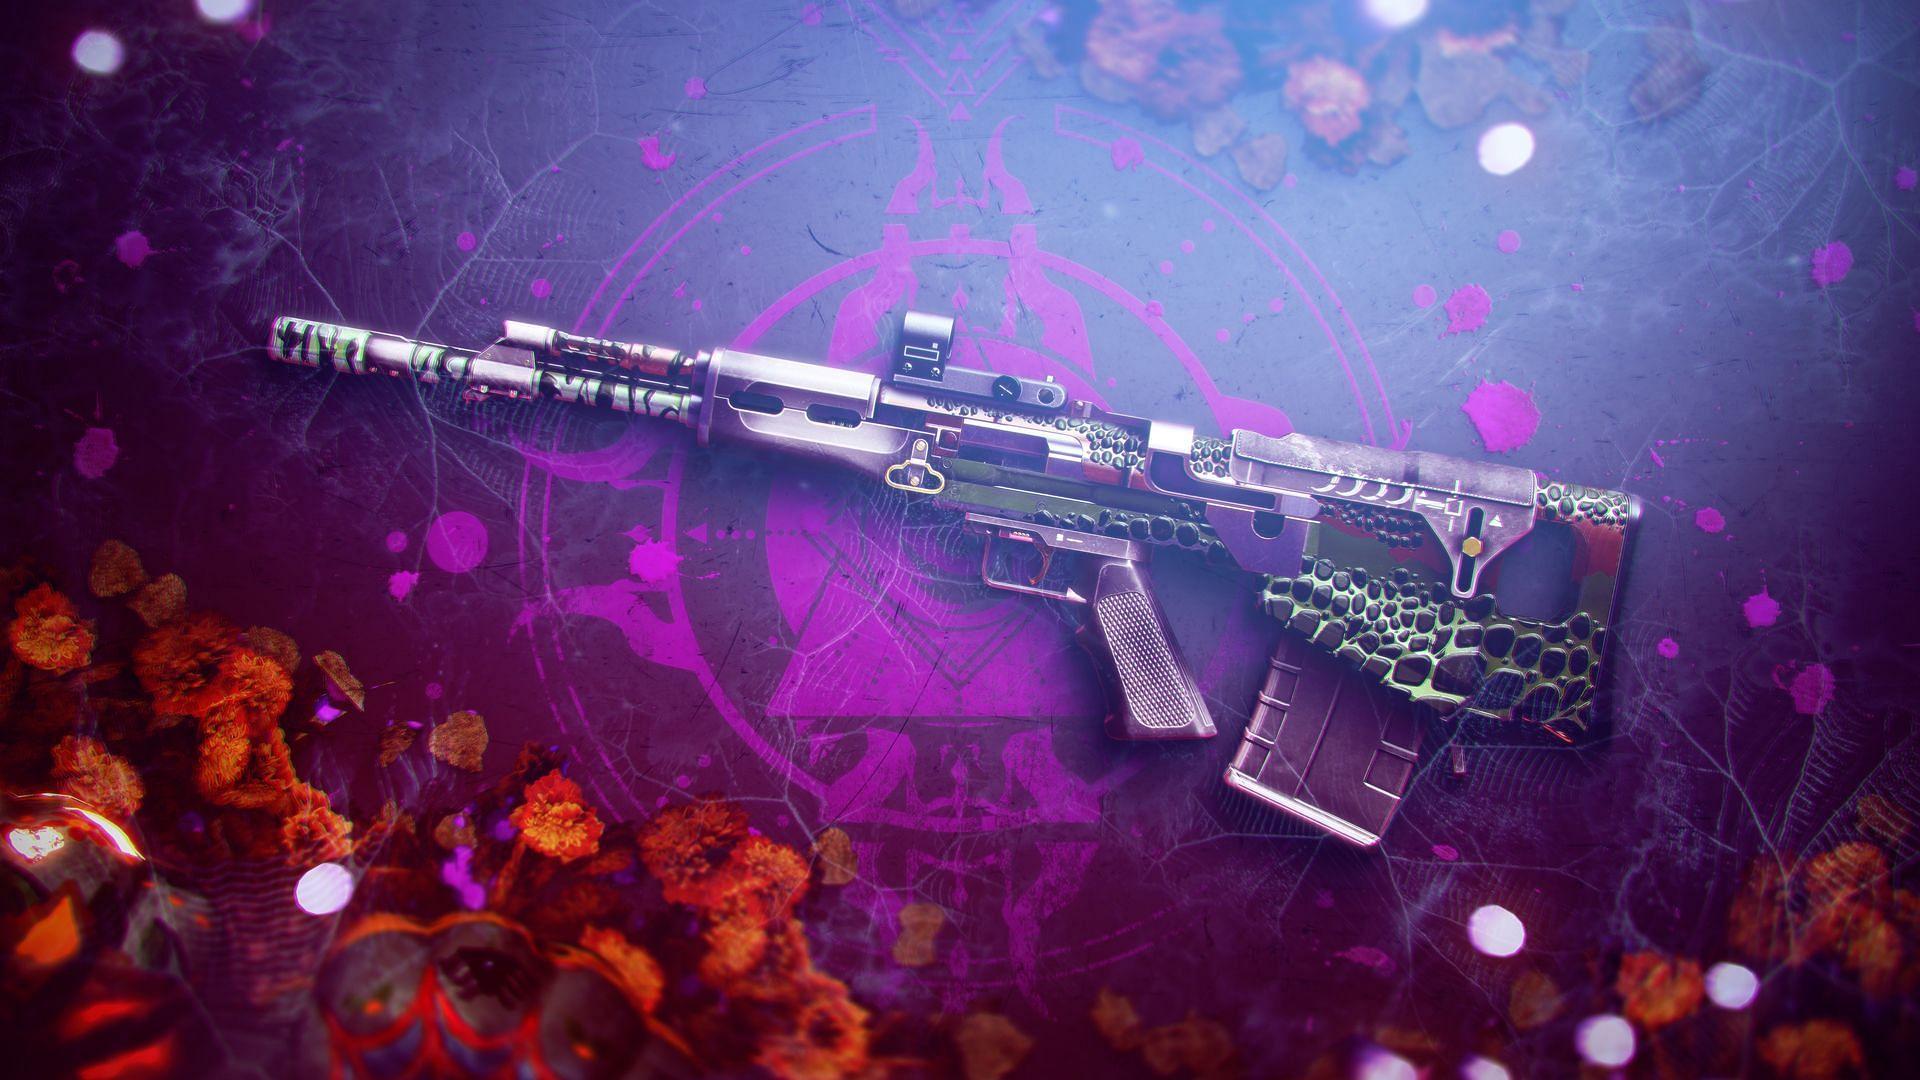 Jurassic Green Legendary pulse rifle (Image via Bungie)